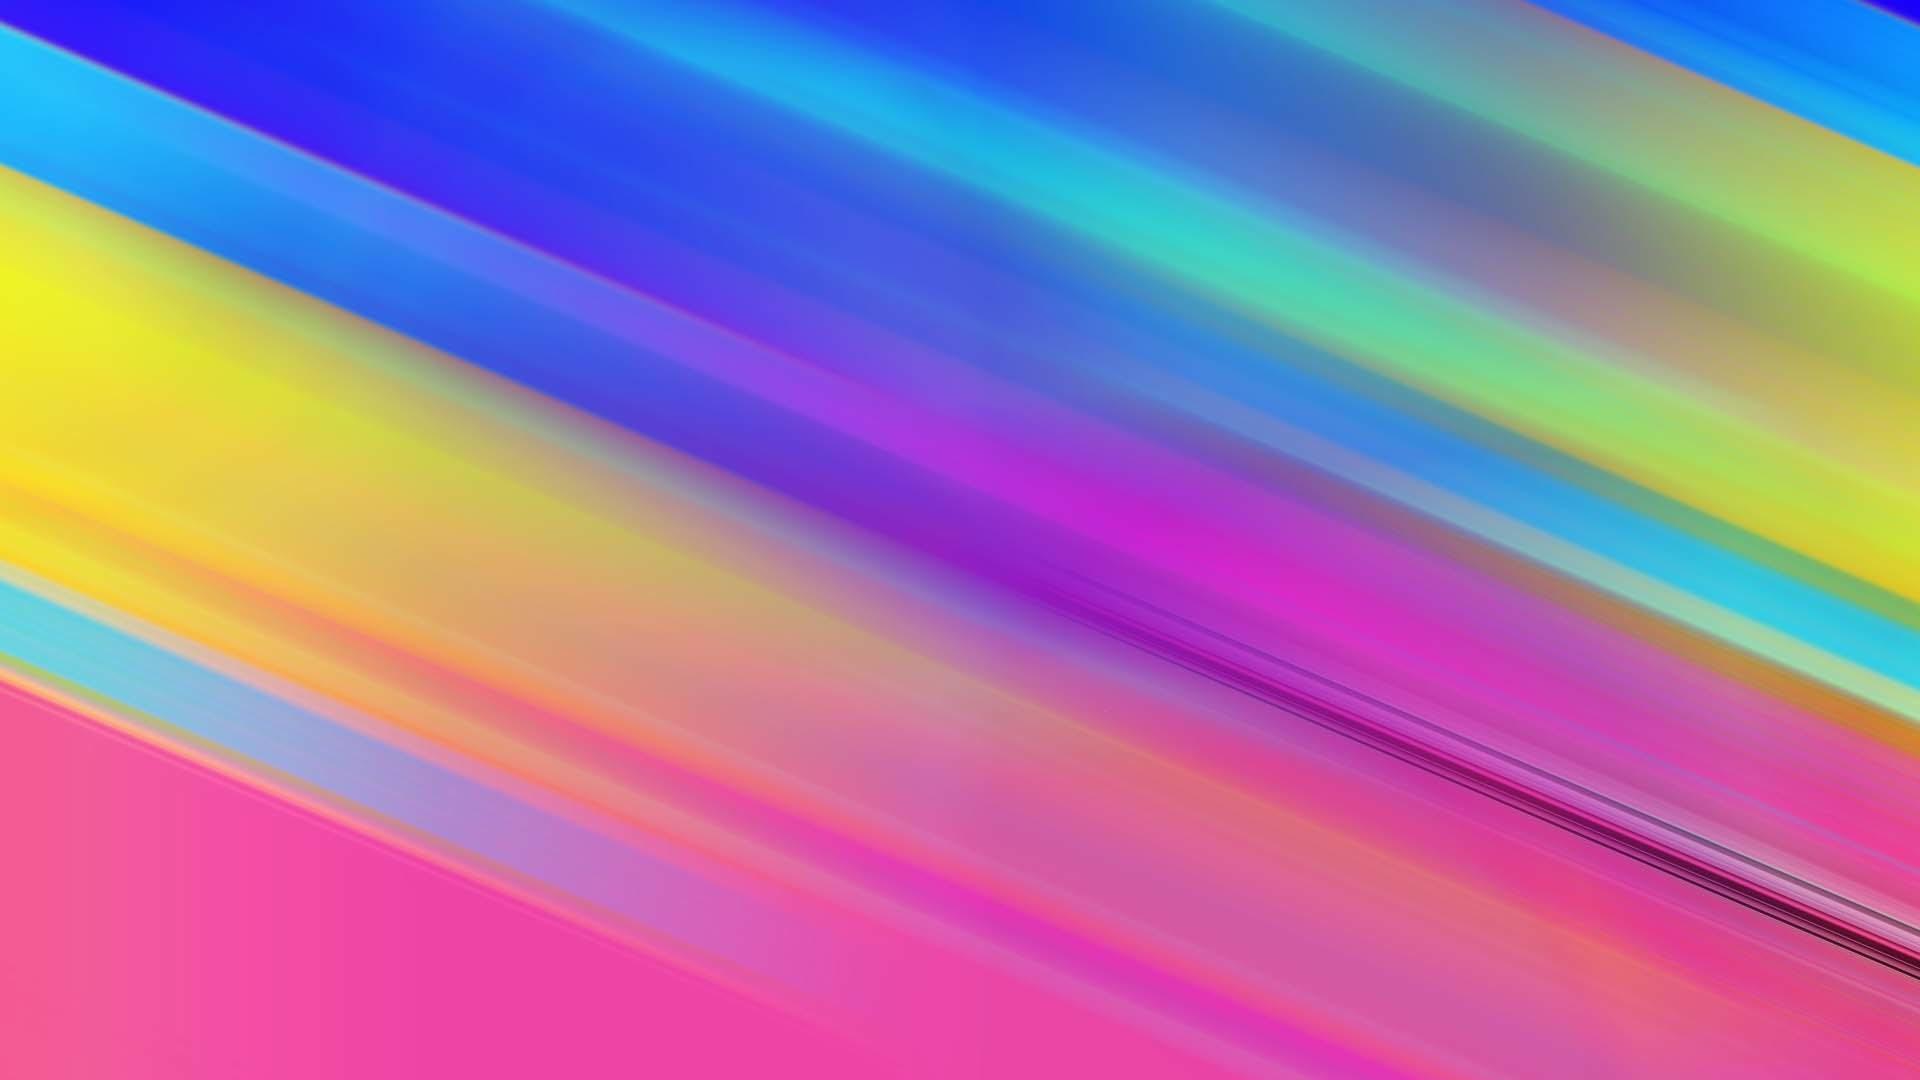 Gradient Rainbow Wallpaper Hd Abstract 4k Wallpapers